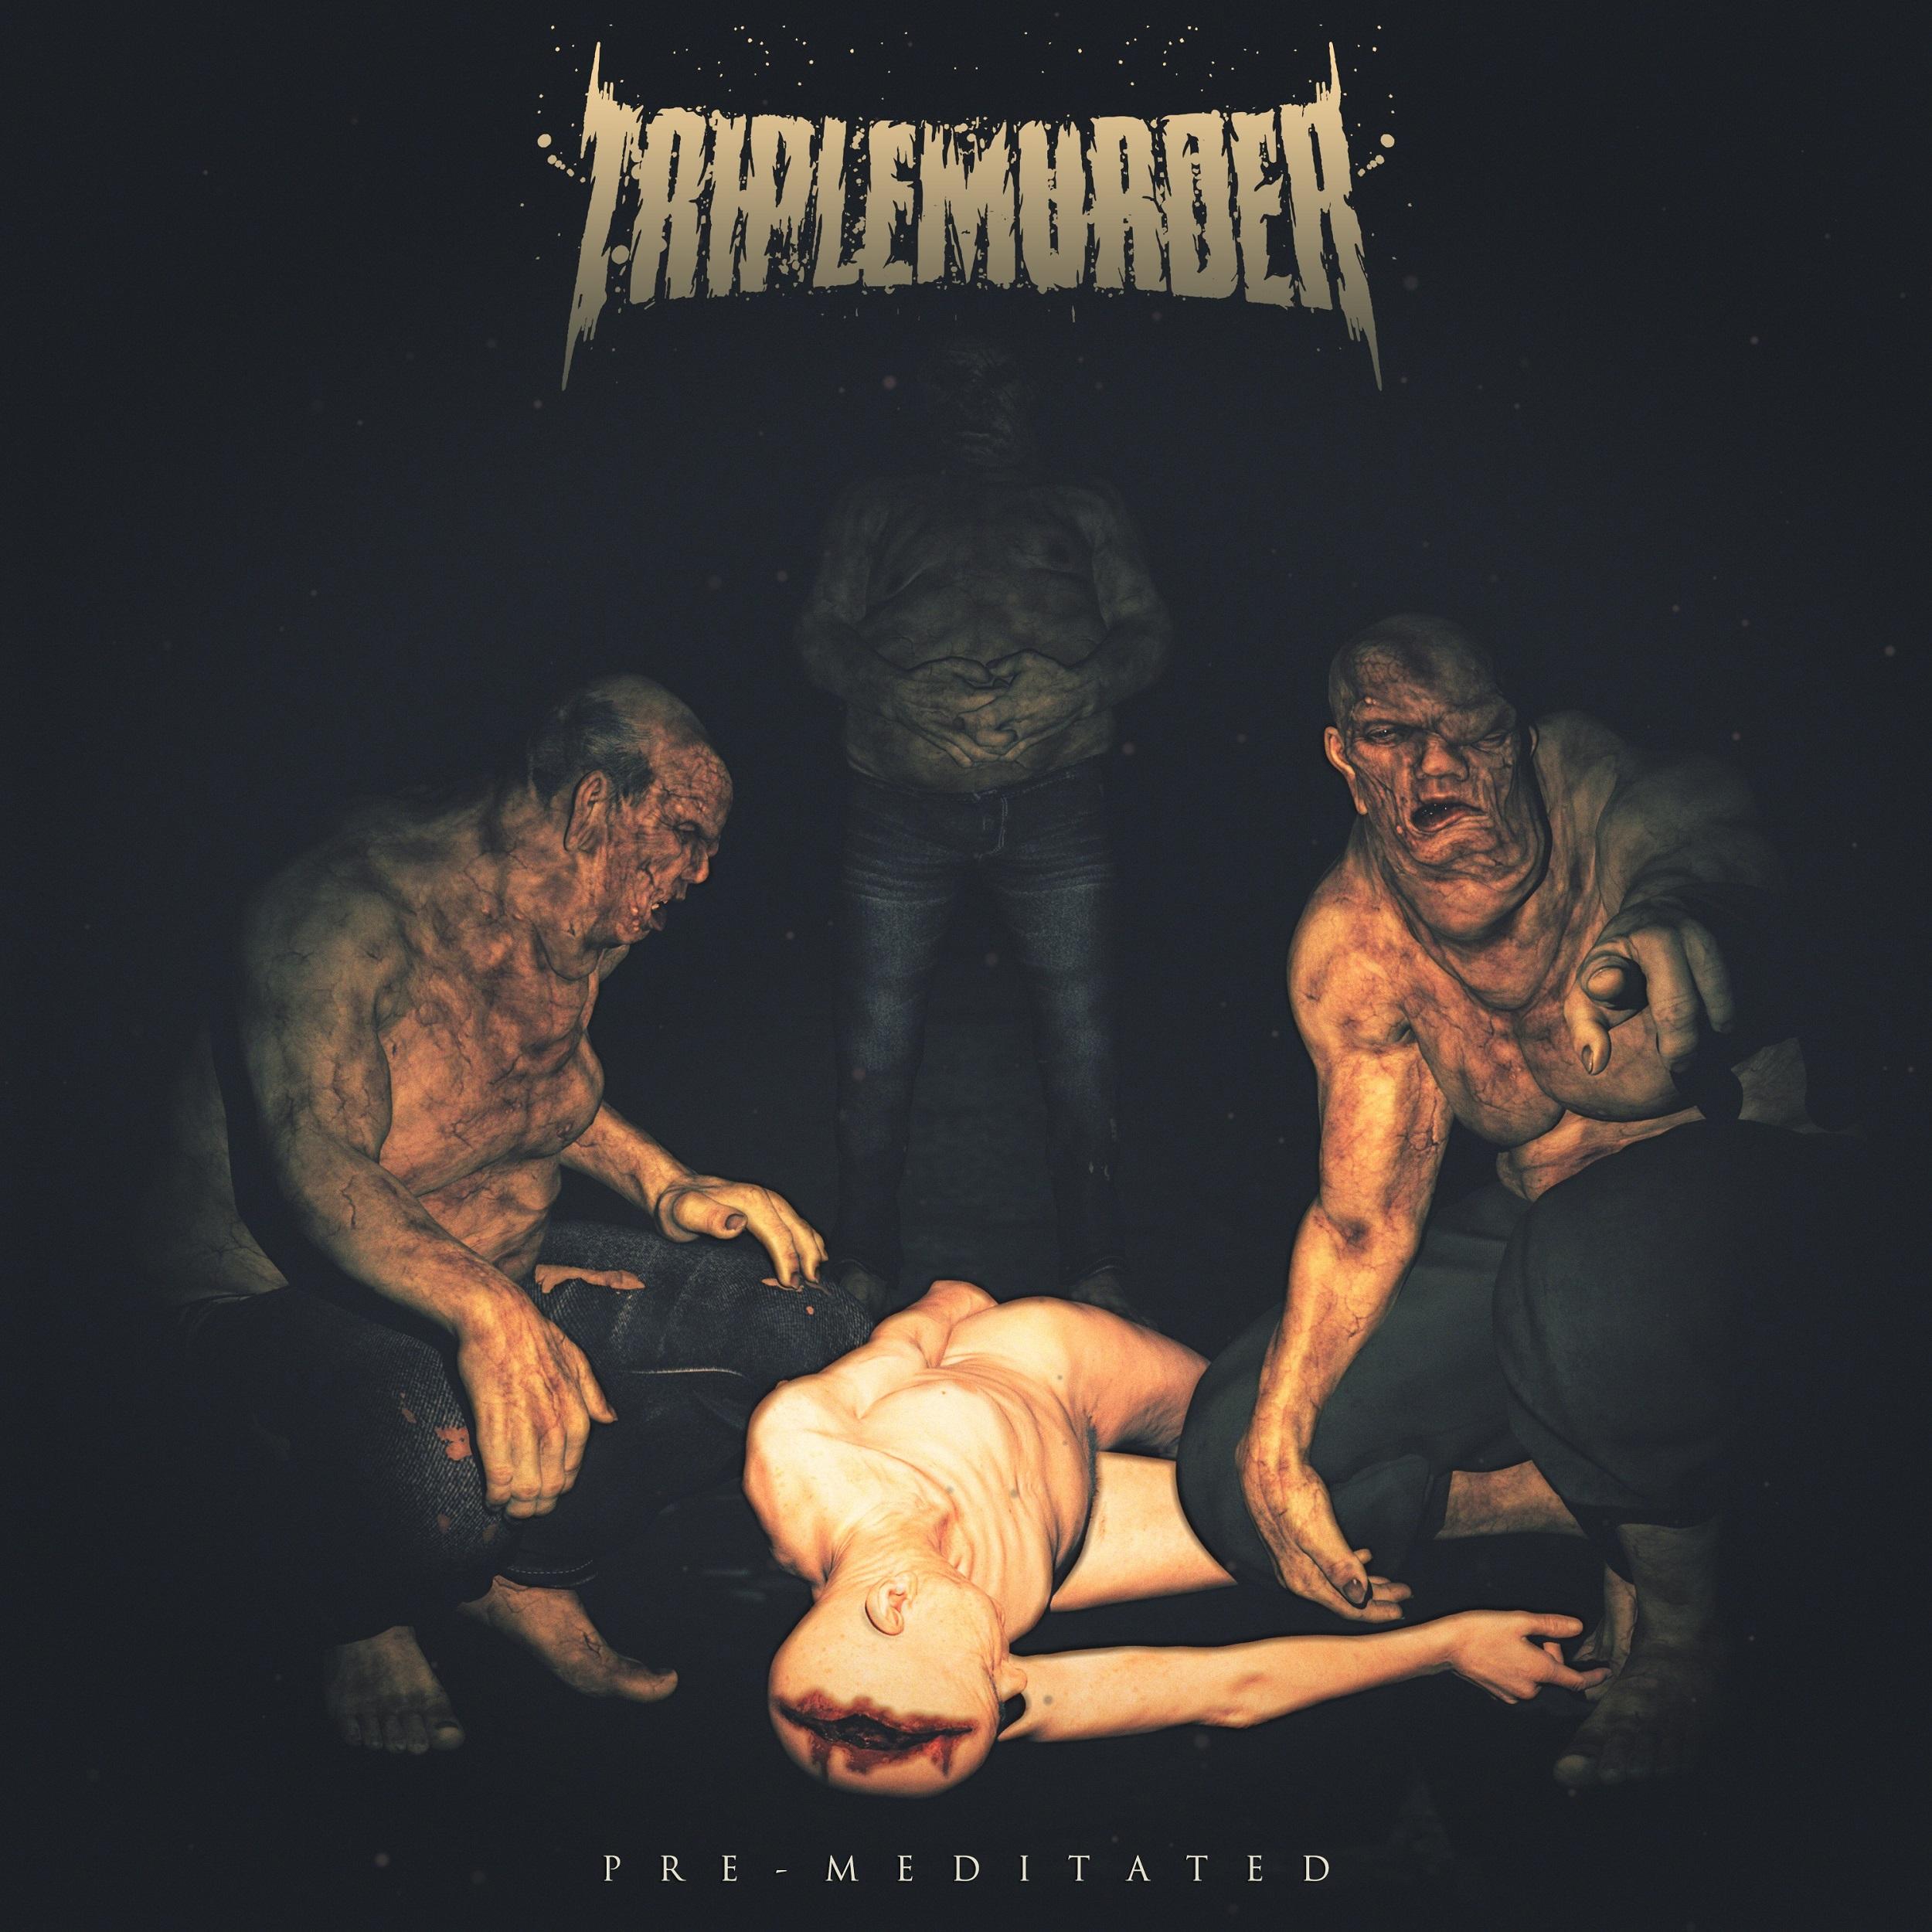 TRIPLE MURDER- pre-meditated